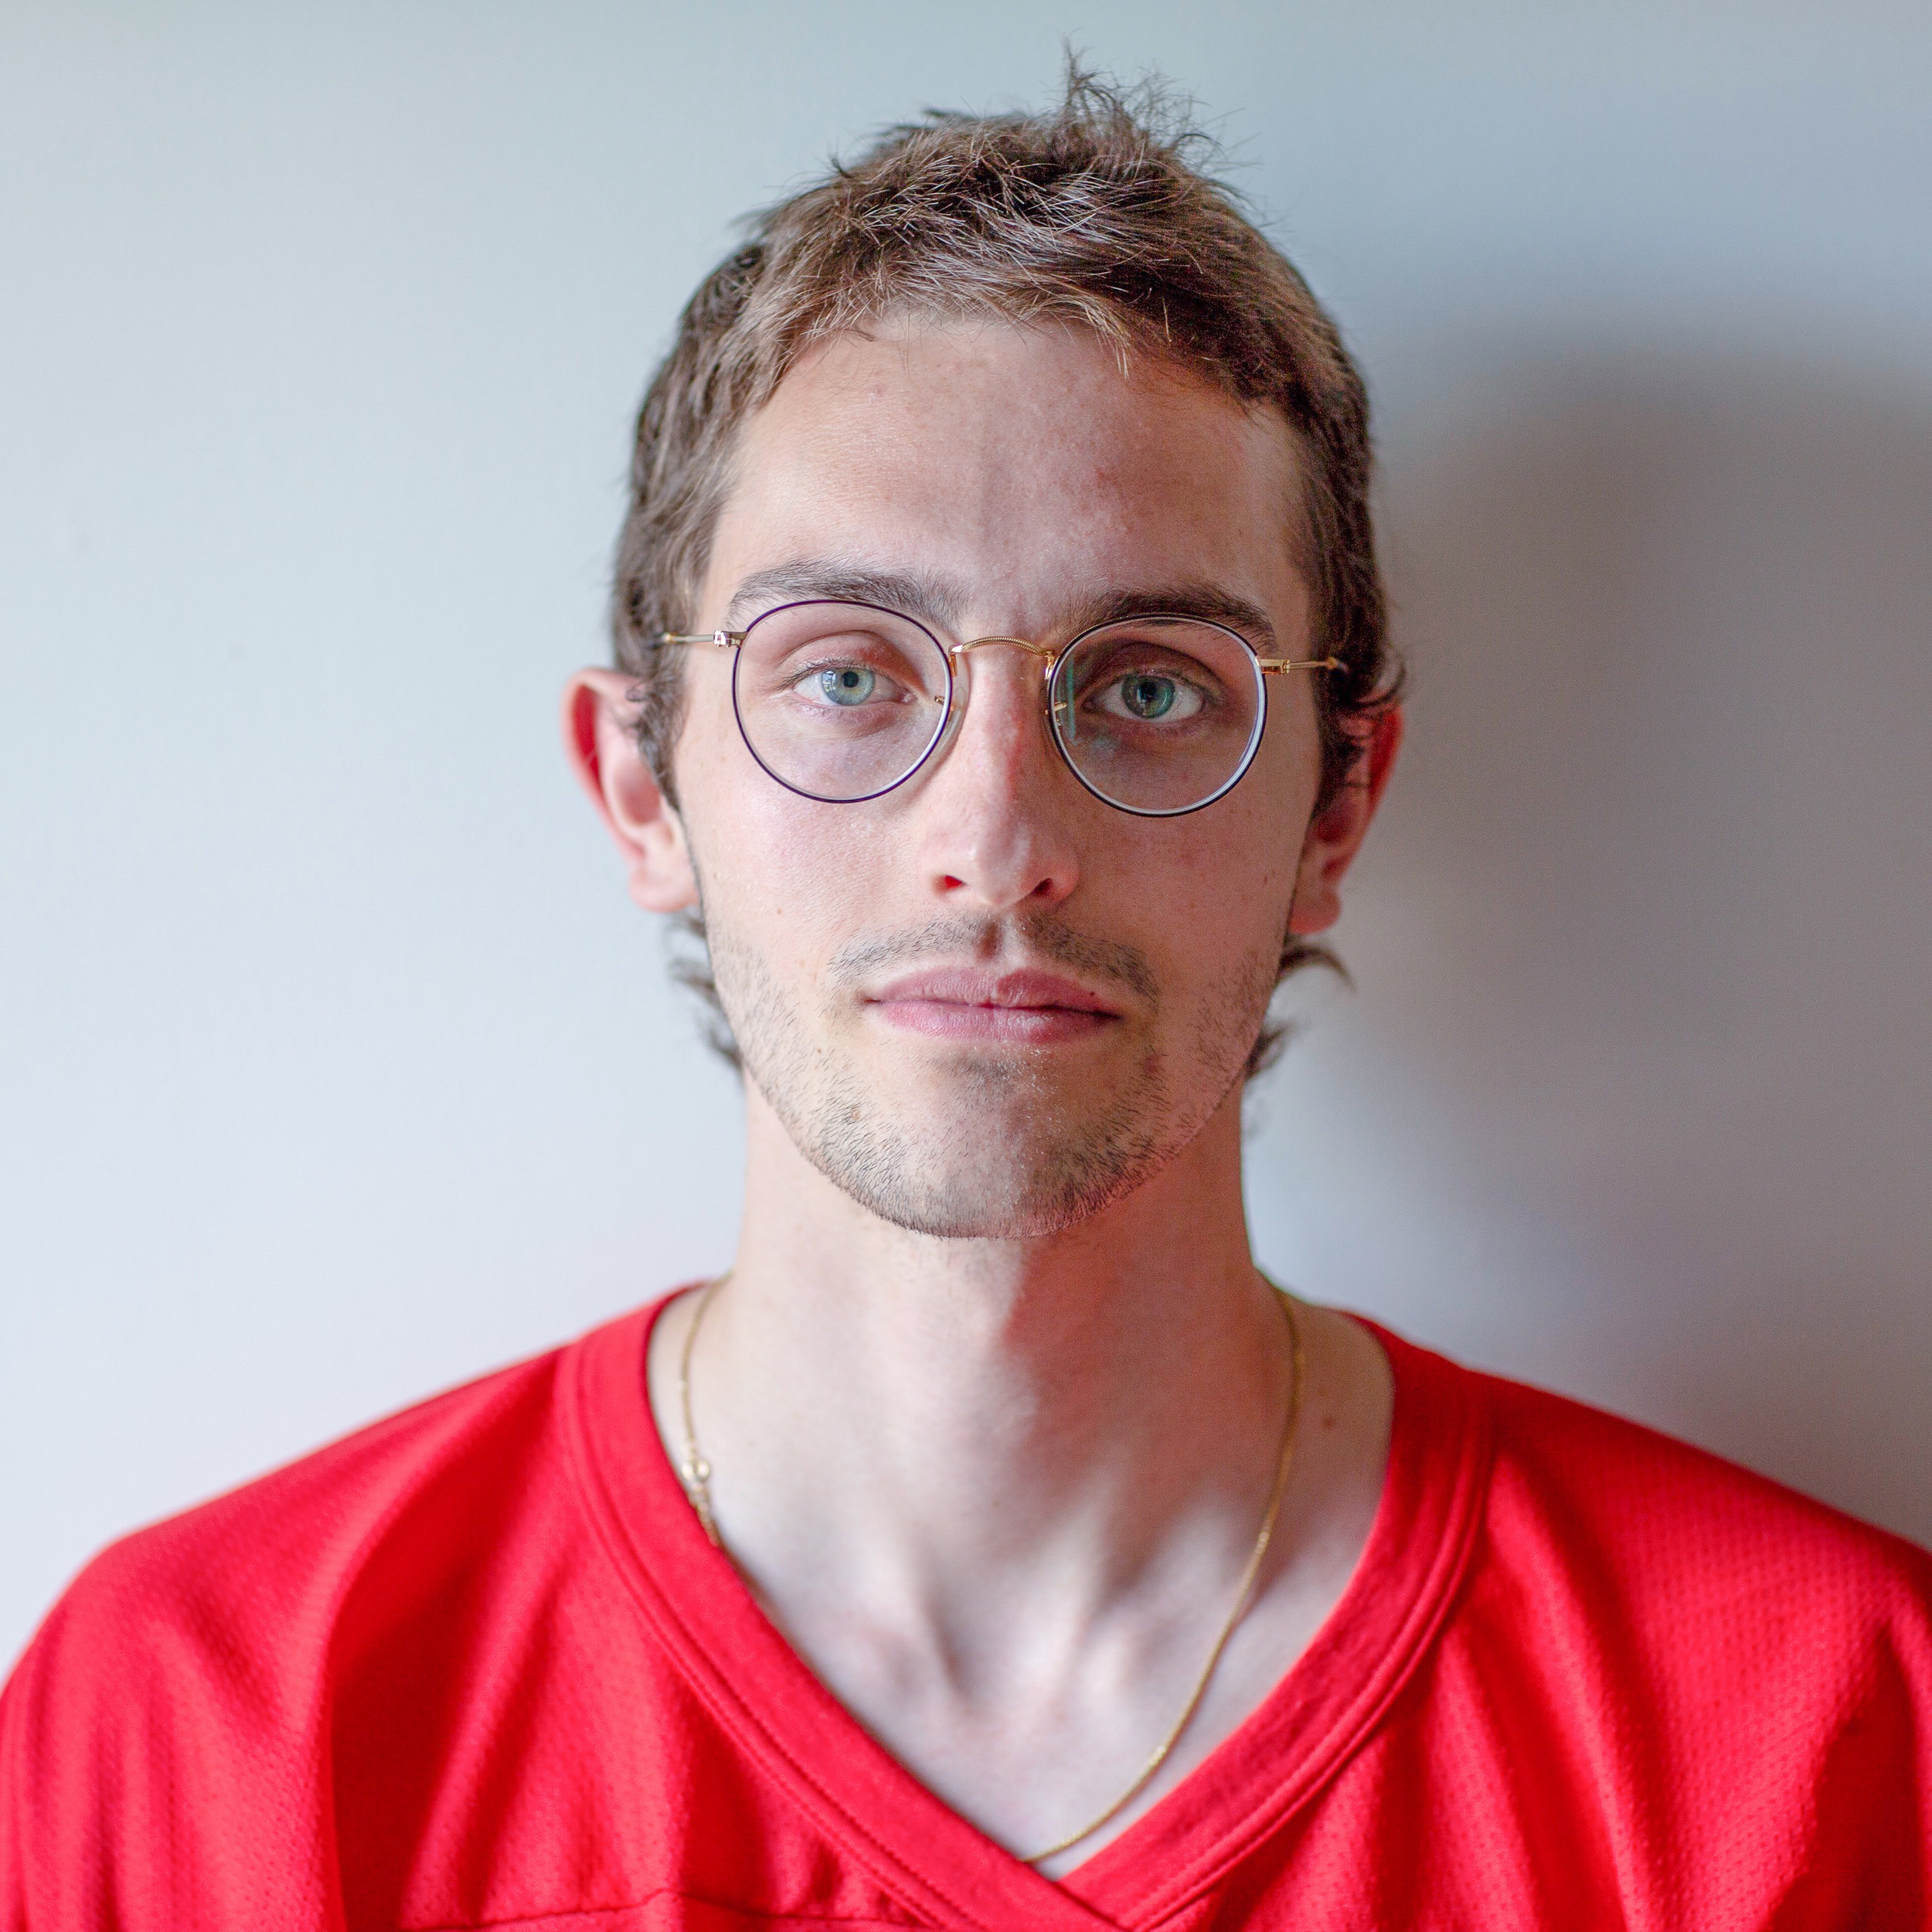 Nathan Mousseau